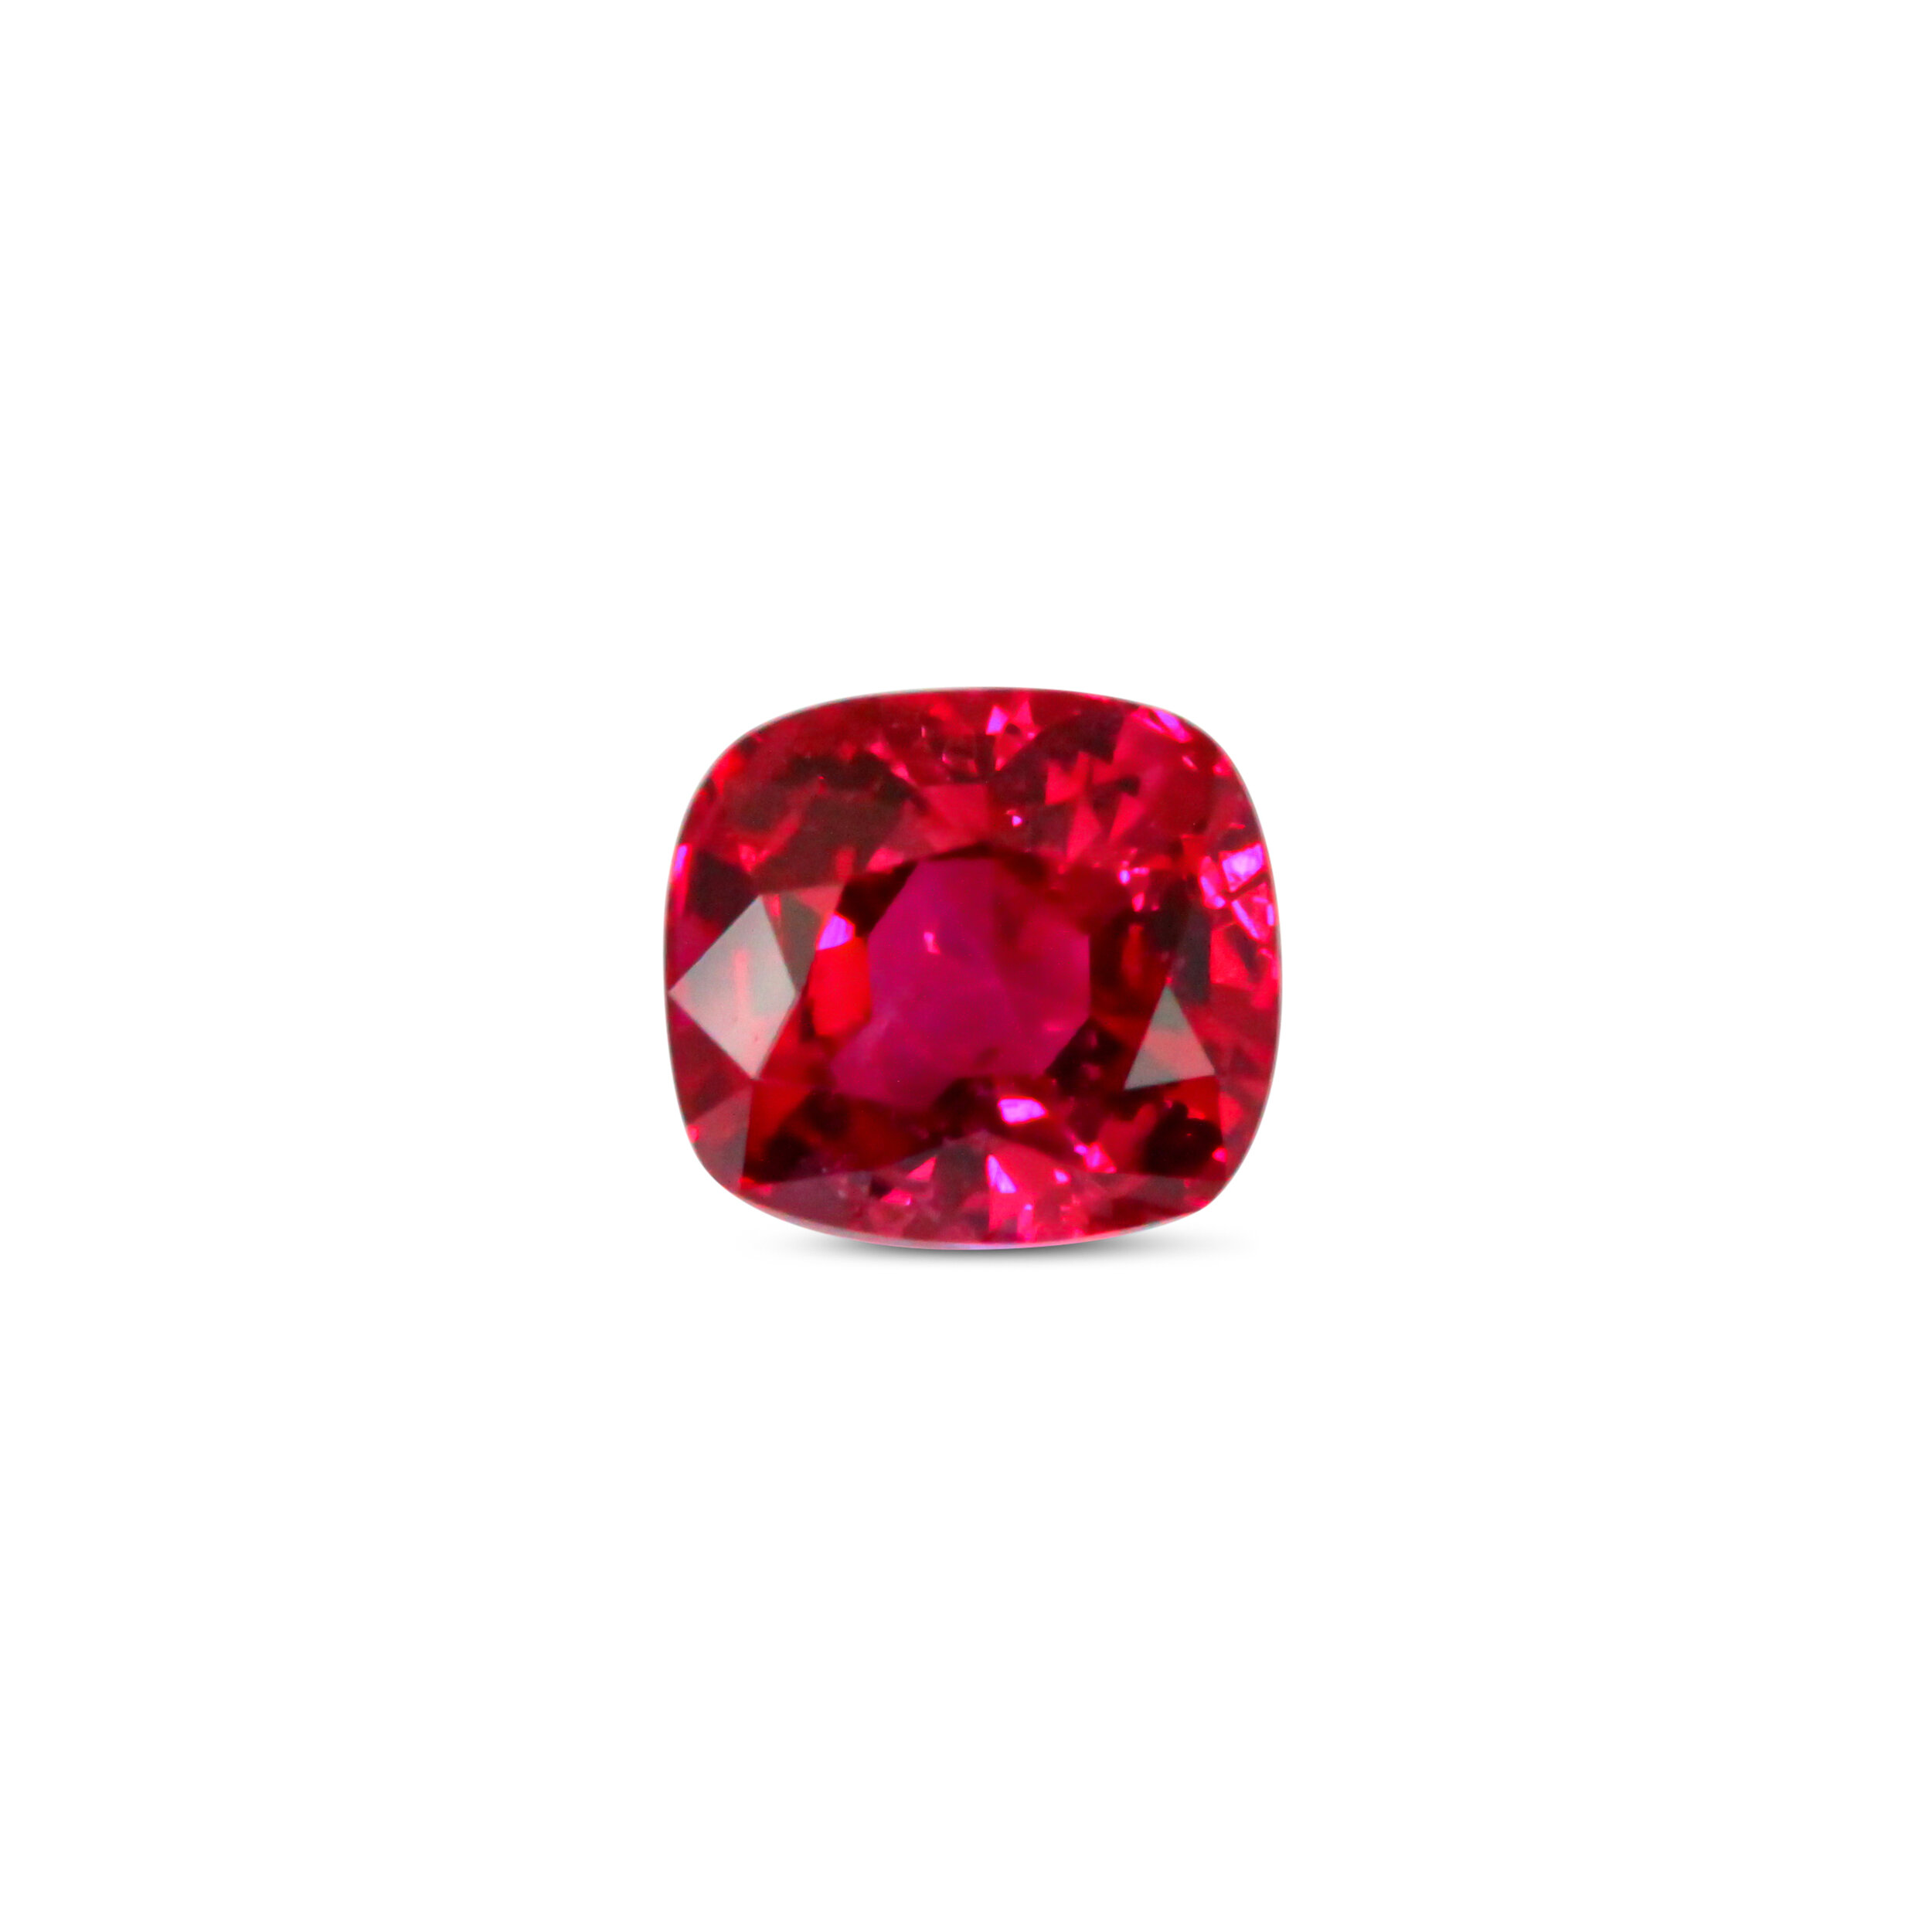 1.32 ct Unheated Burma Ruby, Lotus